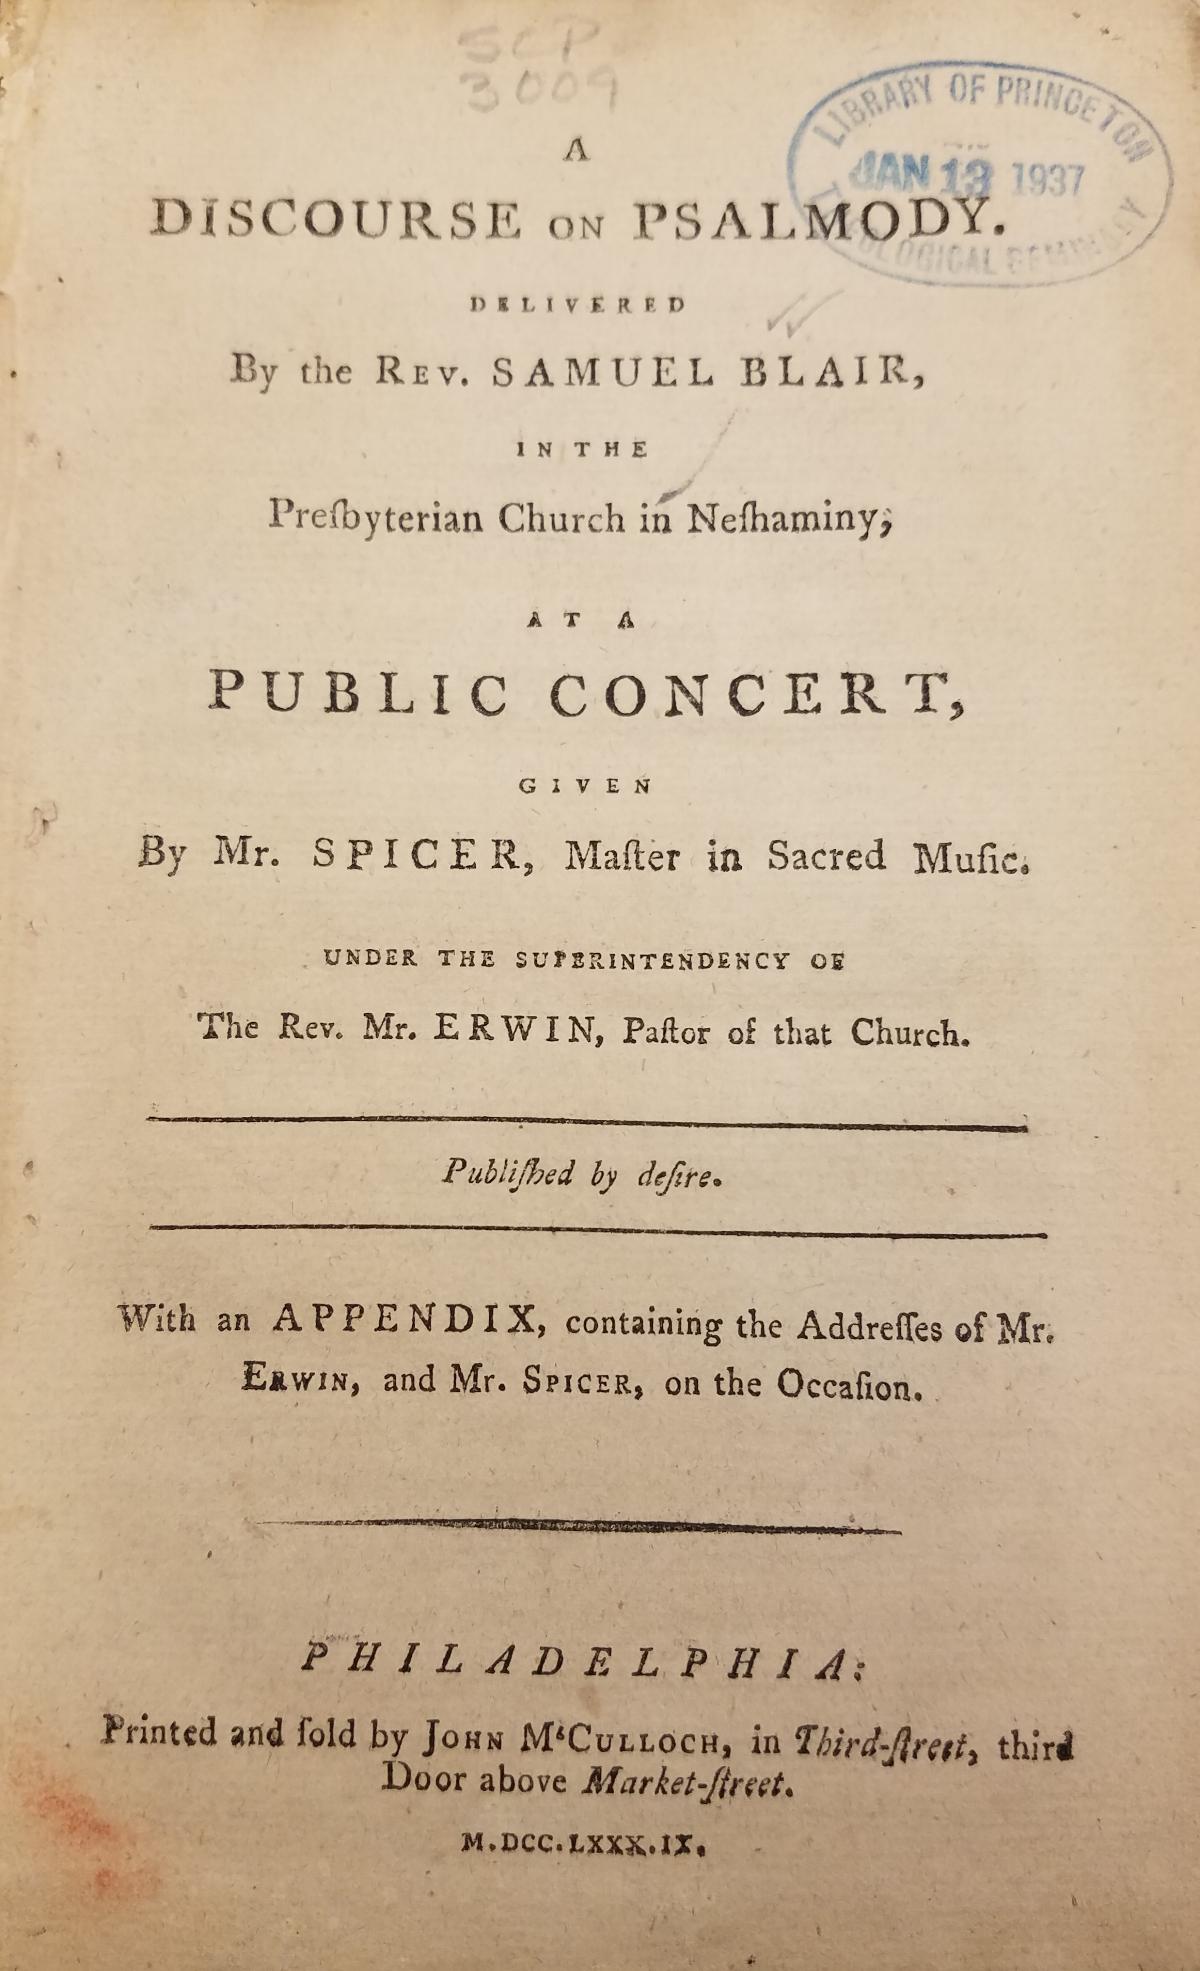 Blair, Samuel, Jr., Discourse on Psalmody Title Page.jpg